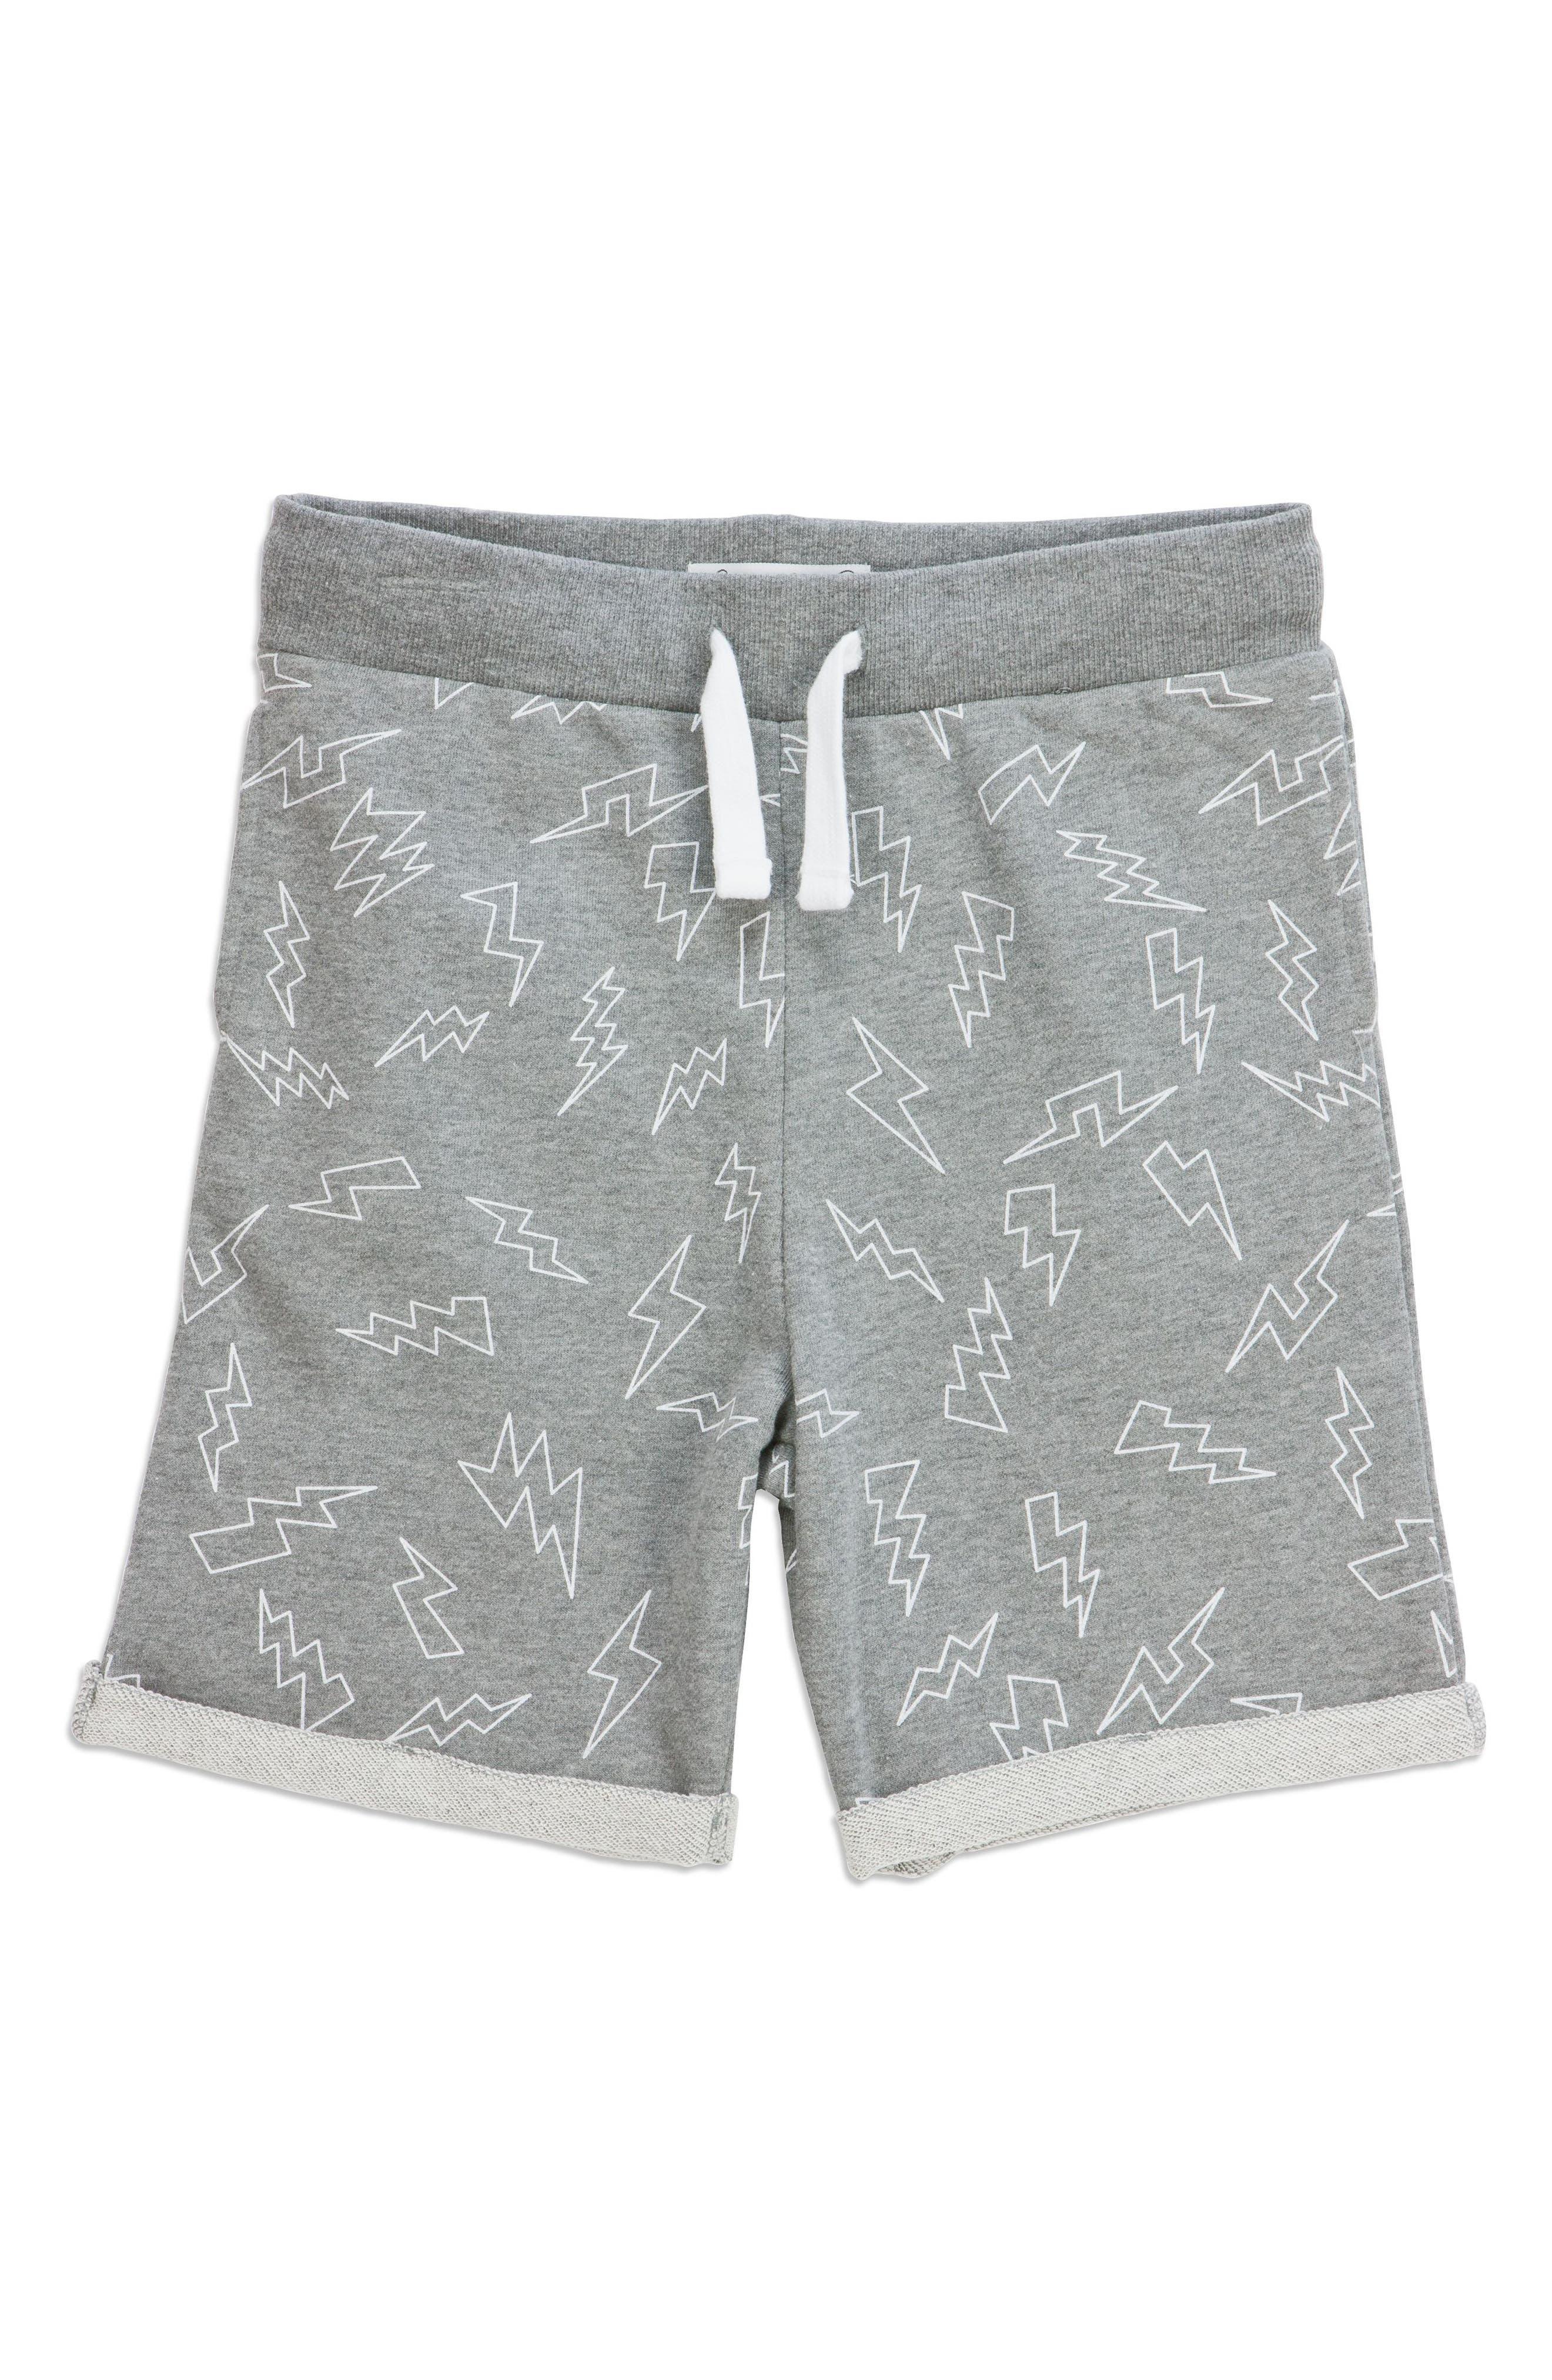 Electric Adriel Knit Shorts,                         Main,                         color, 020